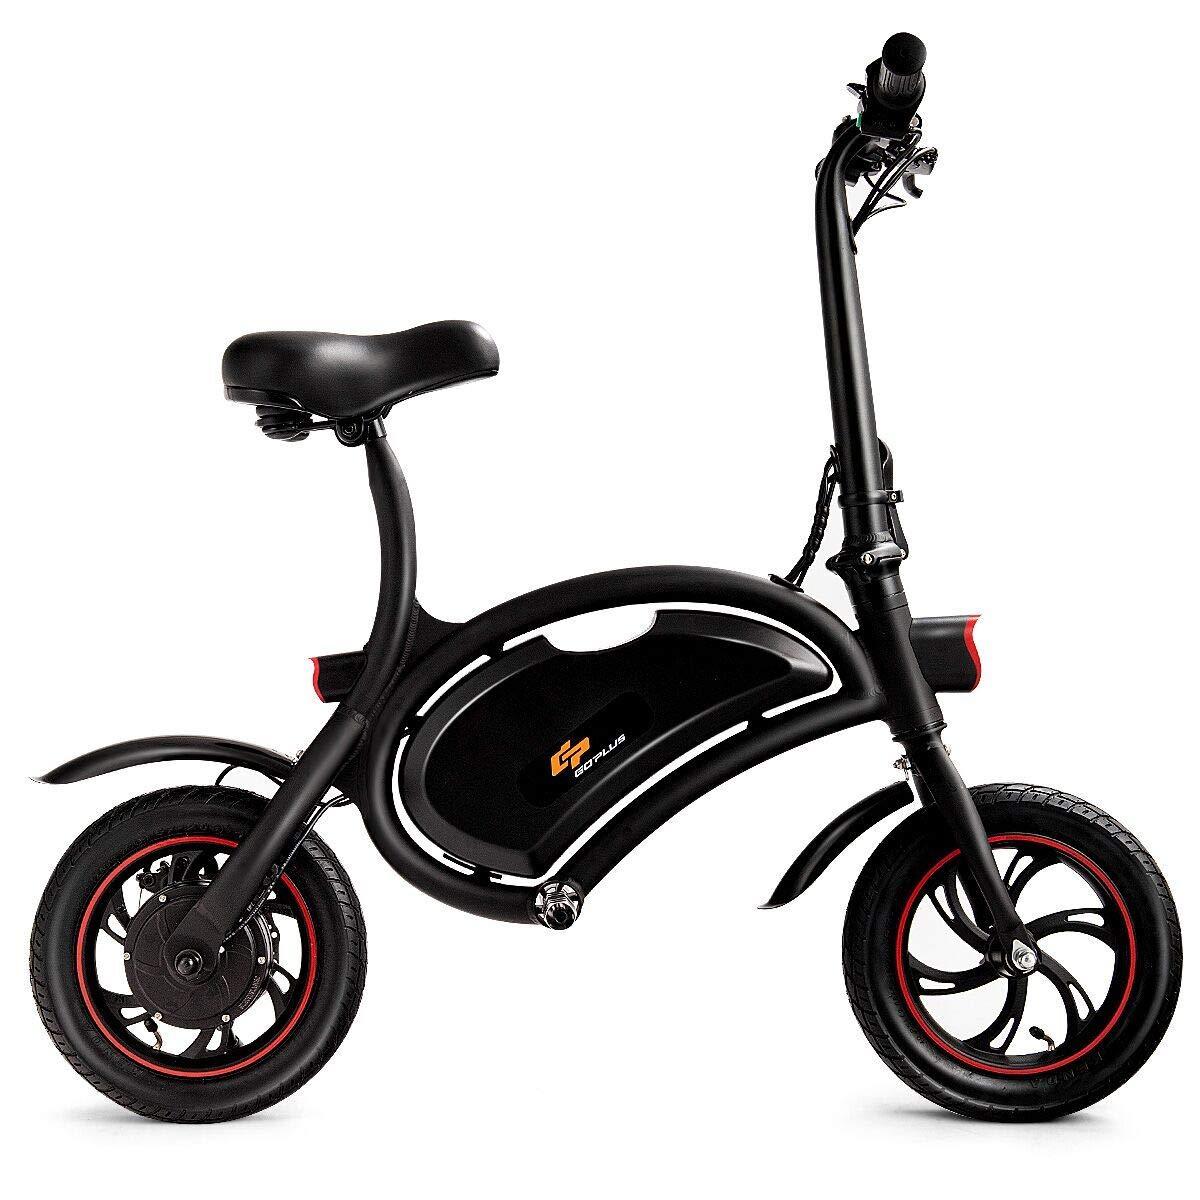 Goplus Folding Electric Bike 350w Lightweight E Bike Mini